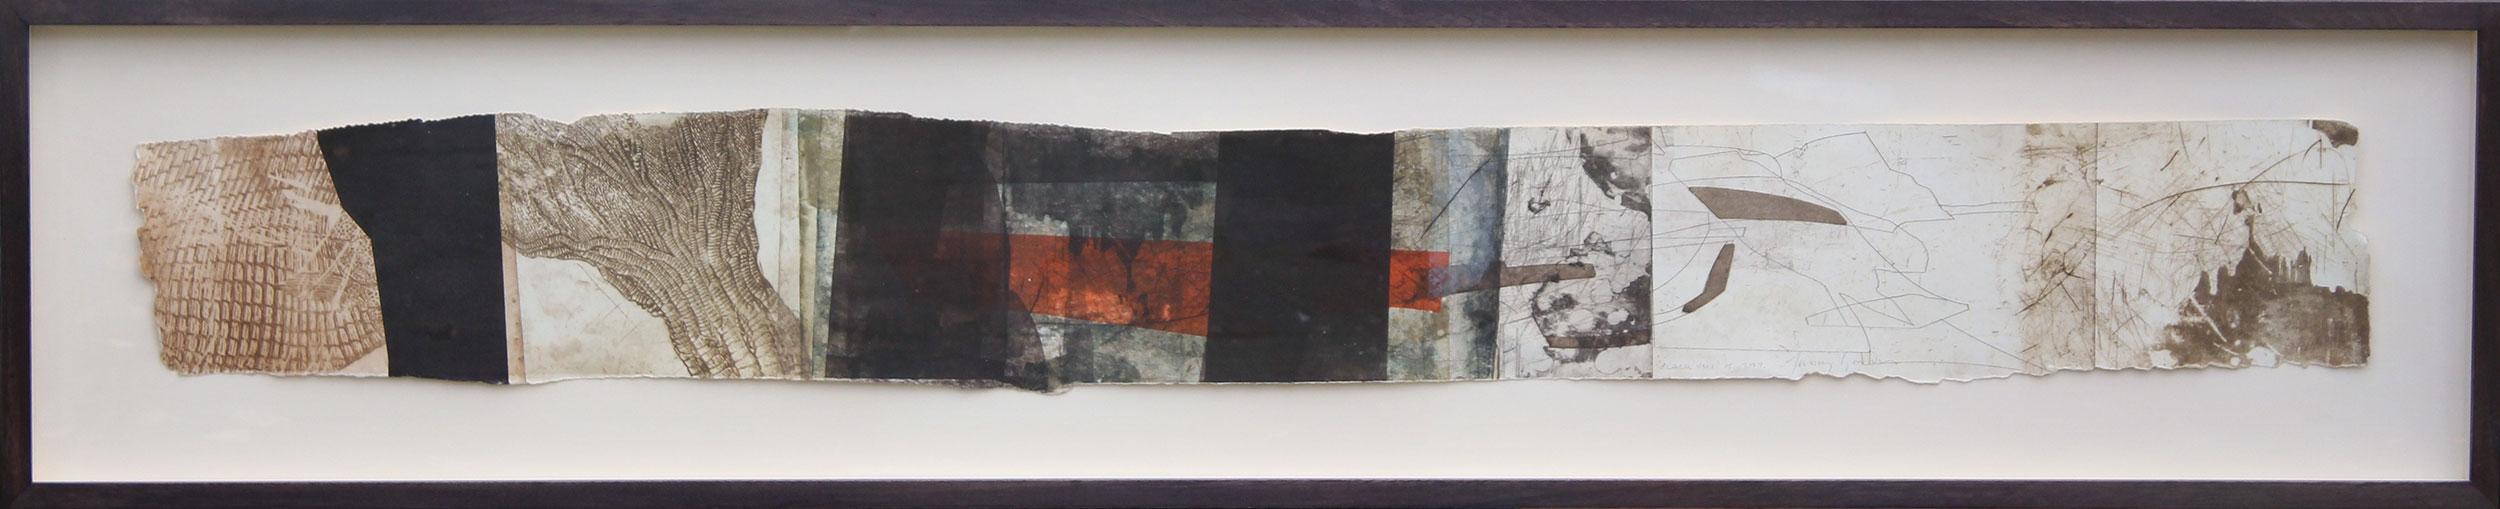 Black Ven, Dorset, 2010, Intaglio Monoprint by Jeremy Gardiner